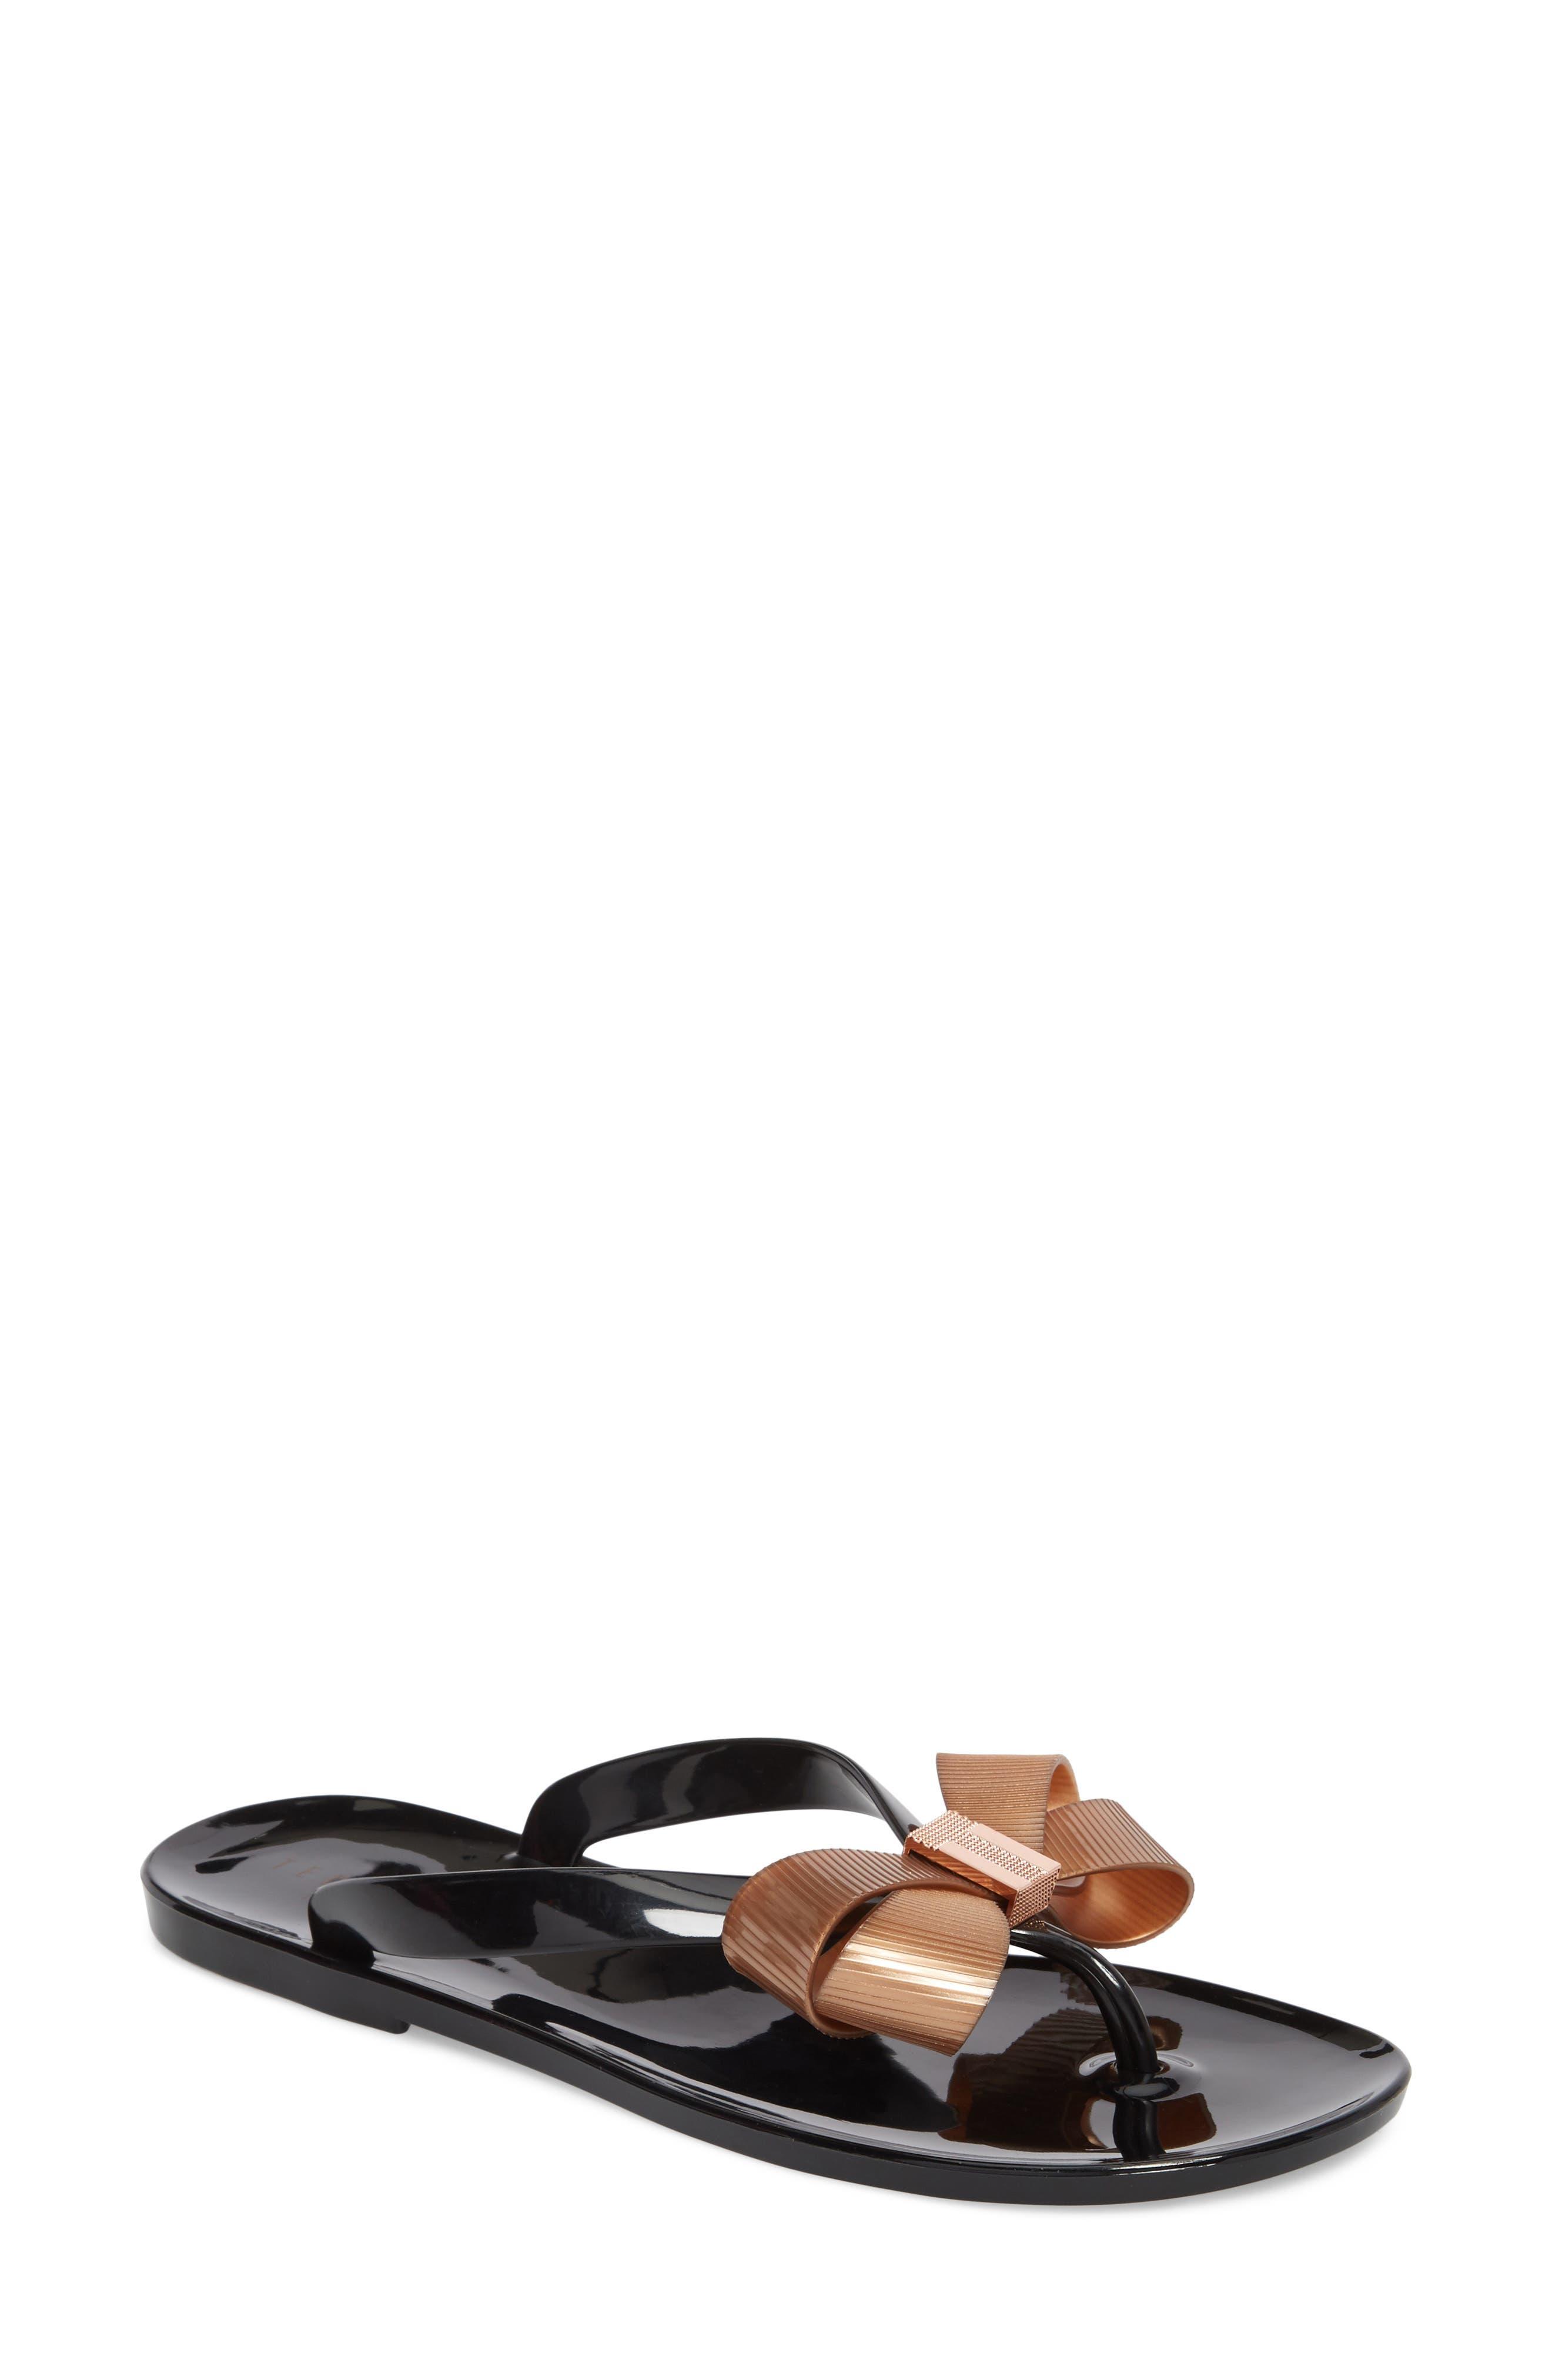 7668bf7a7 Ted Baker London Flip-Flops   Sandals for Women